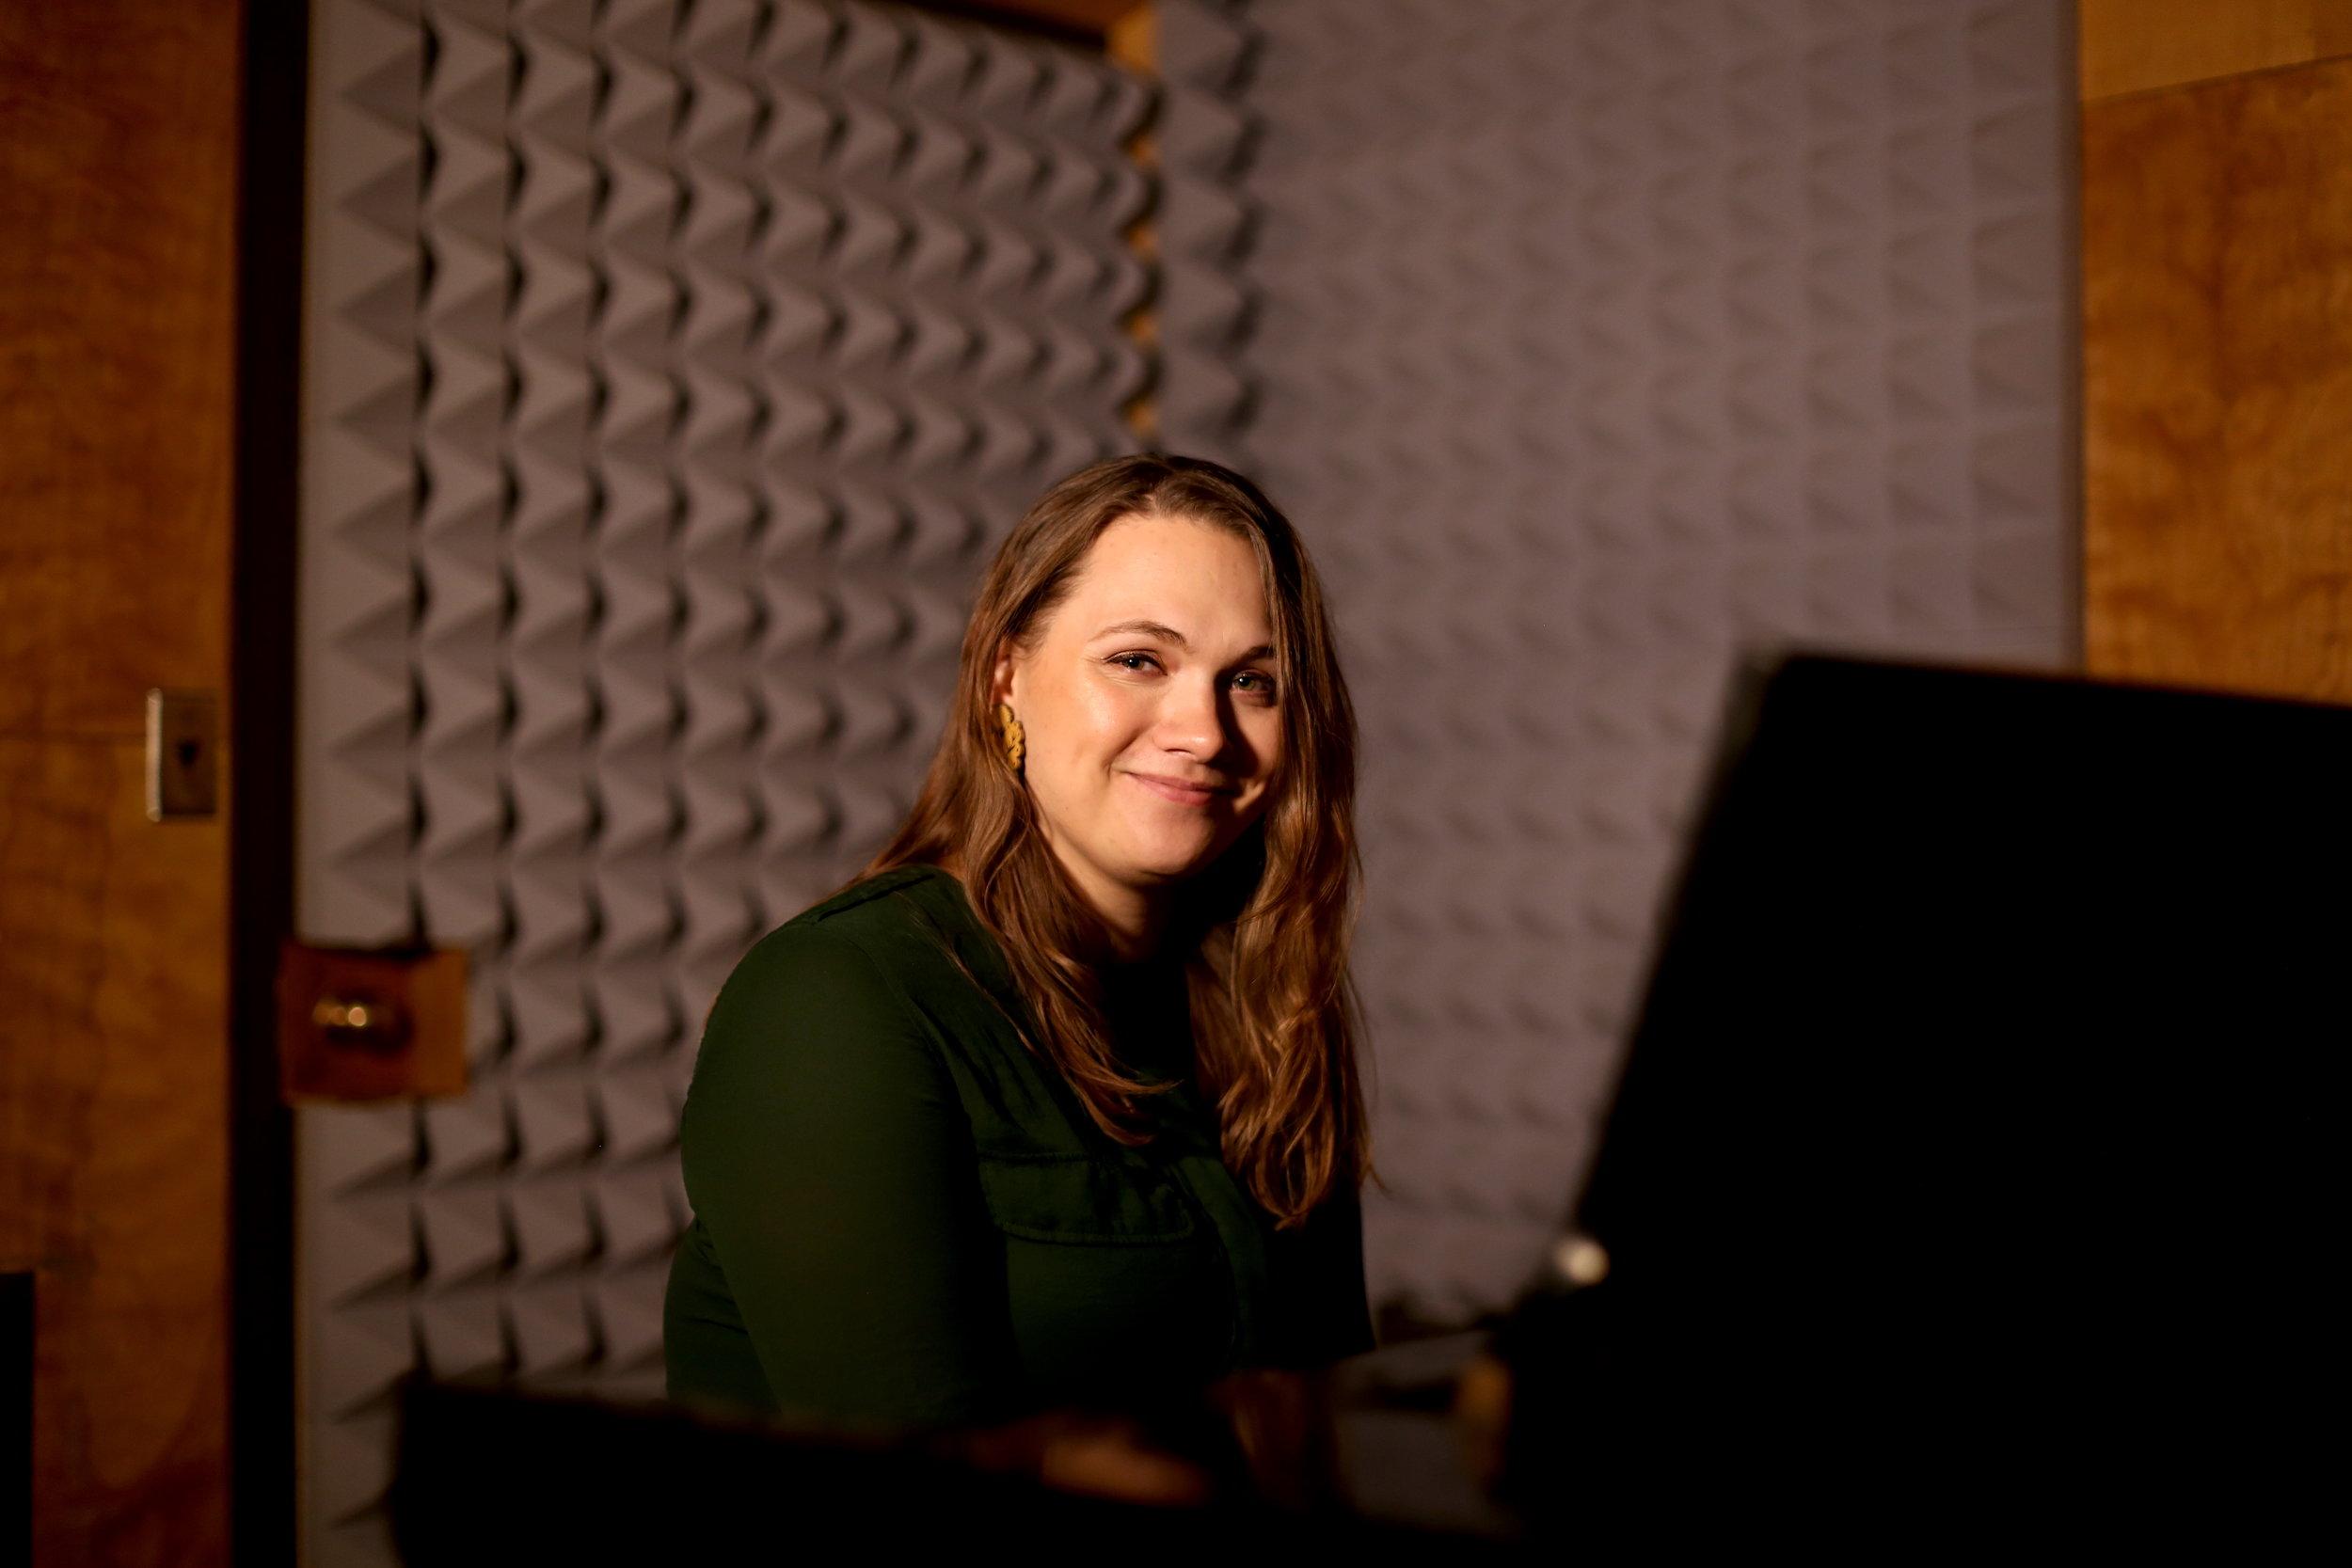 Semaňáková is a Fullbright Scholar studying Audio Arts at Syracuse University. Photo by  Jiaman (Maggie) Peng .